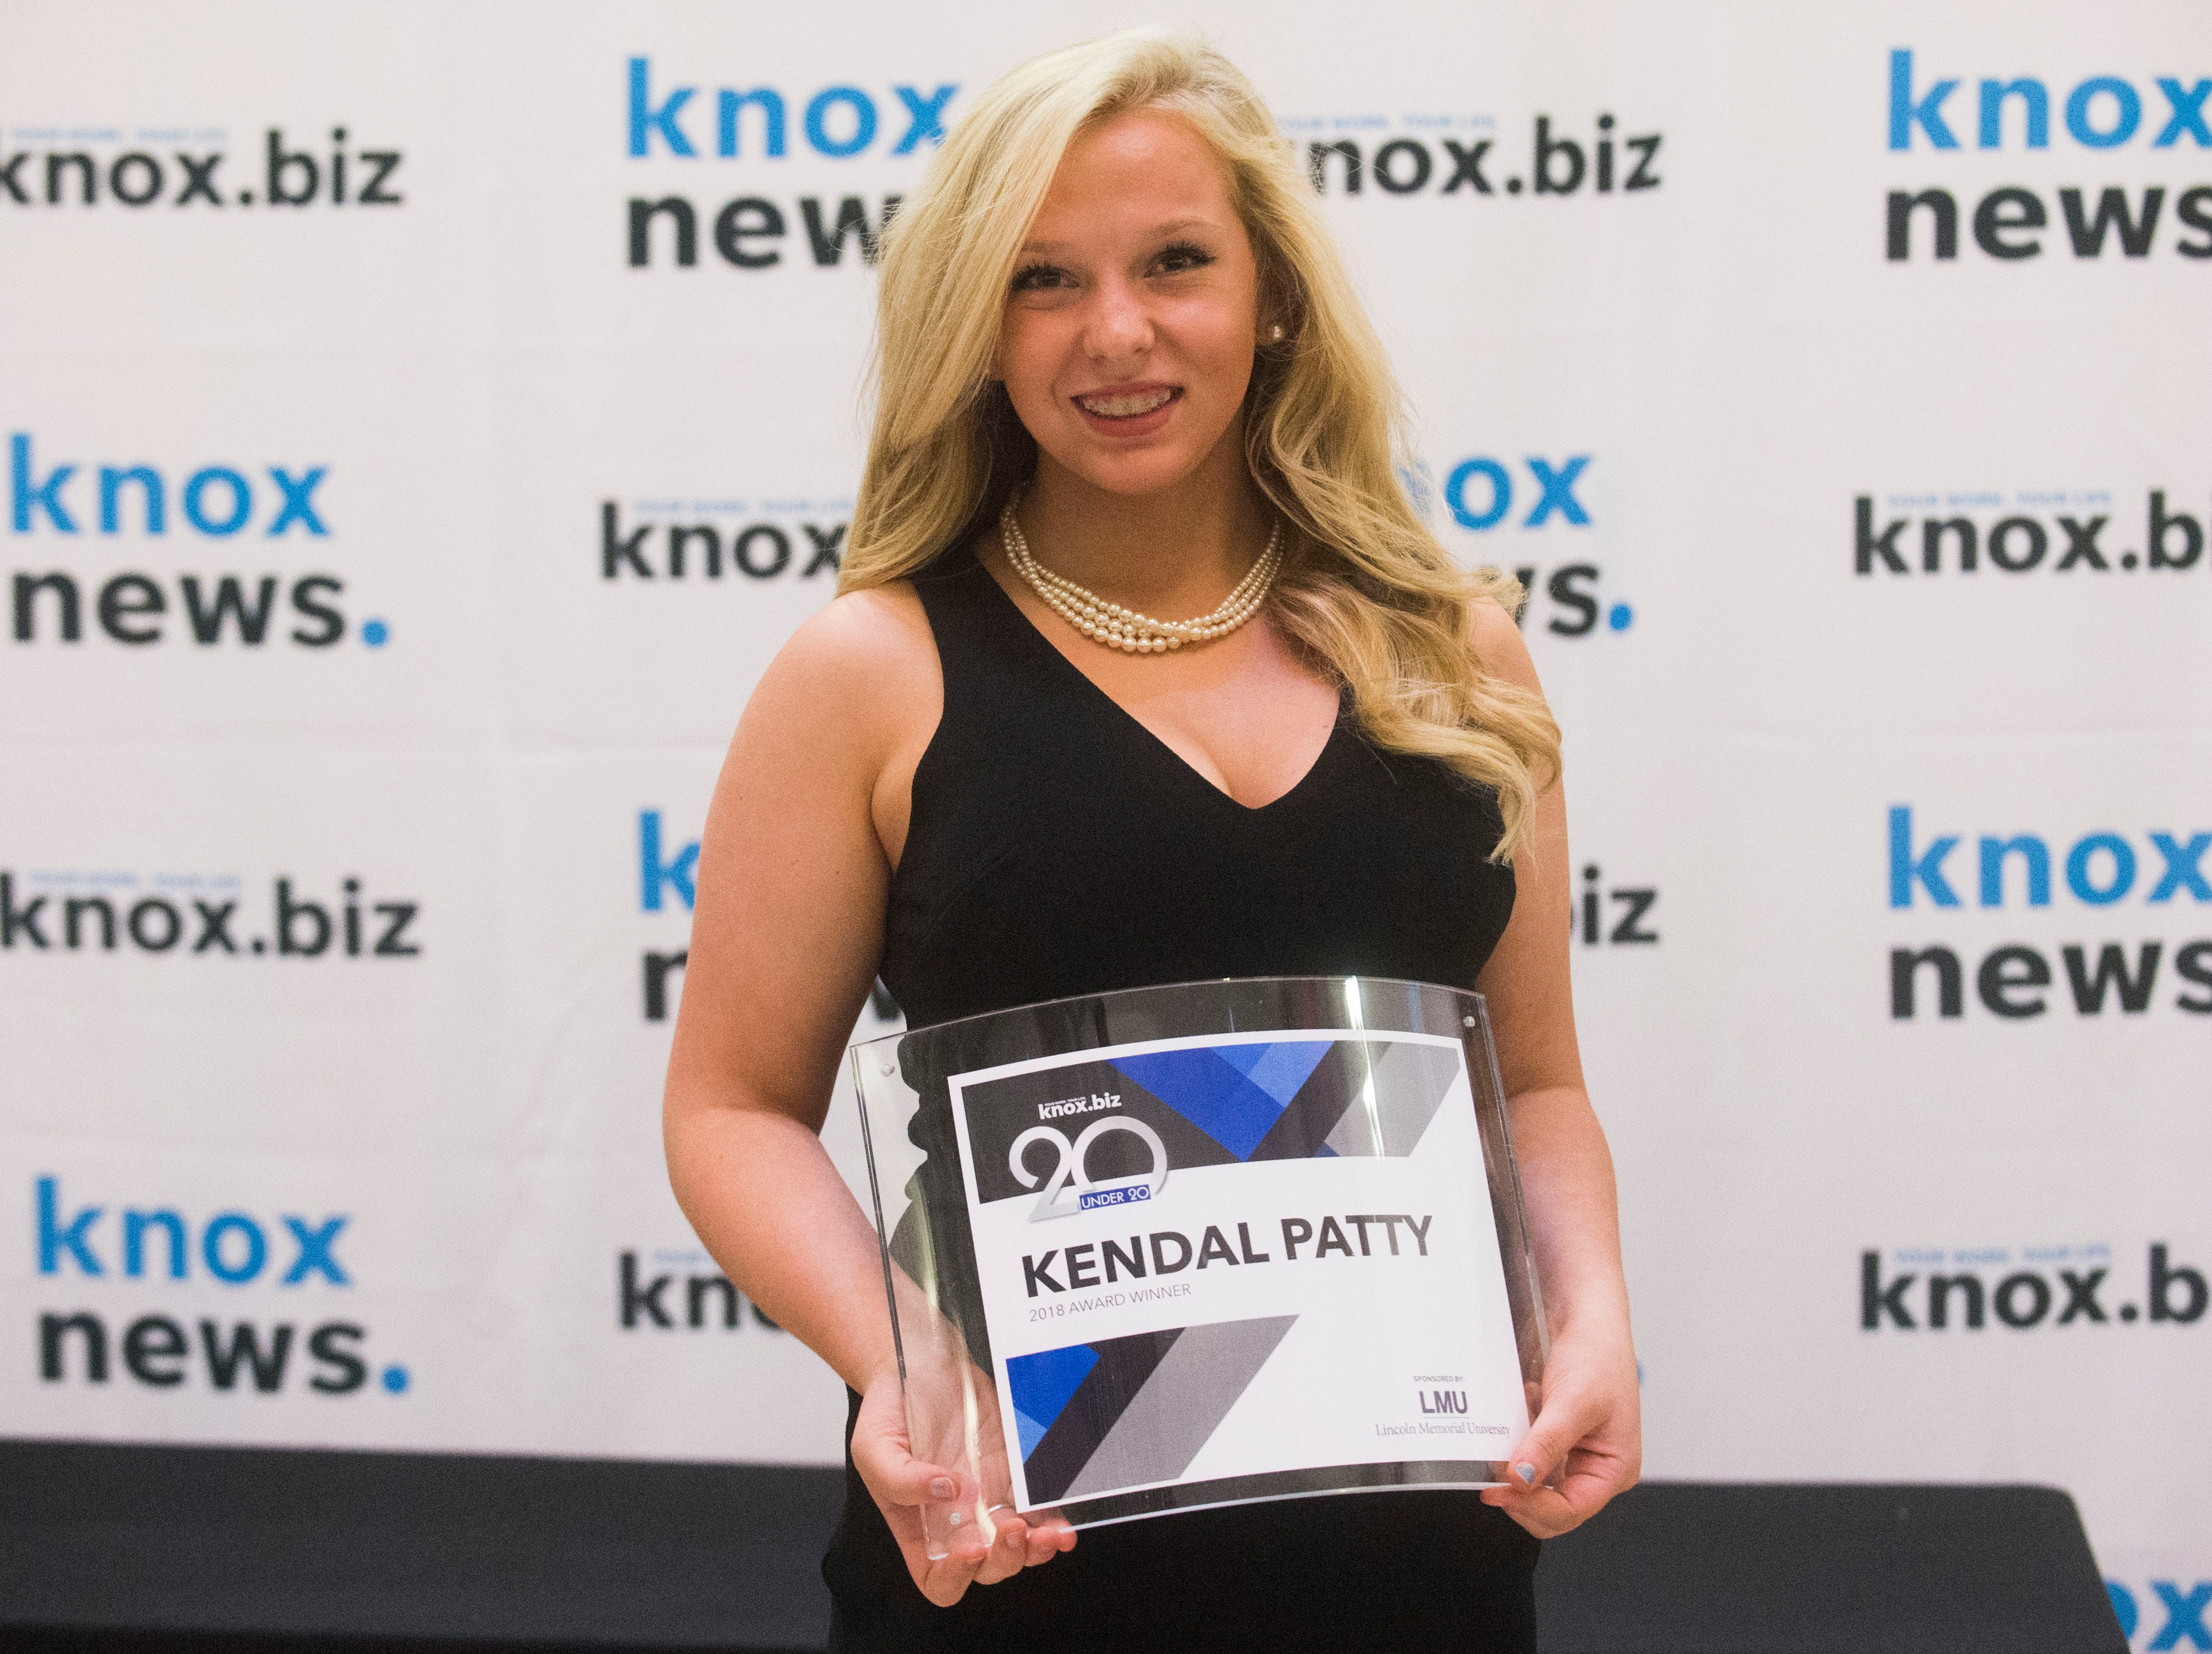 Kendal Patty, 20 under 20 award recipient.